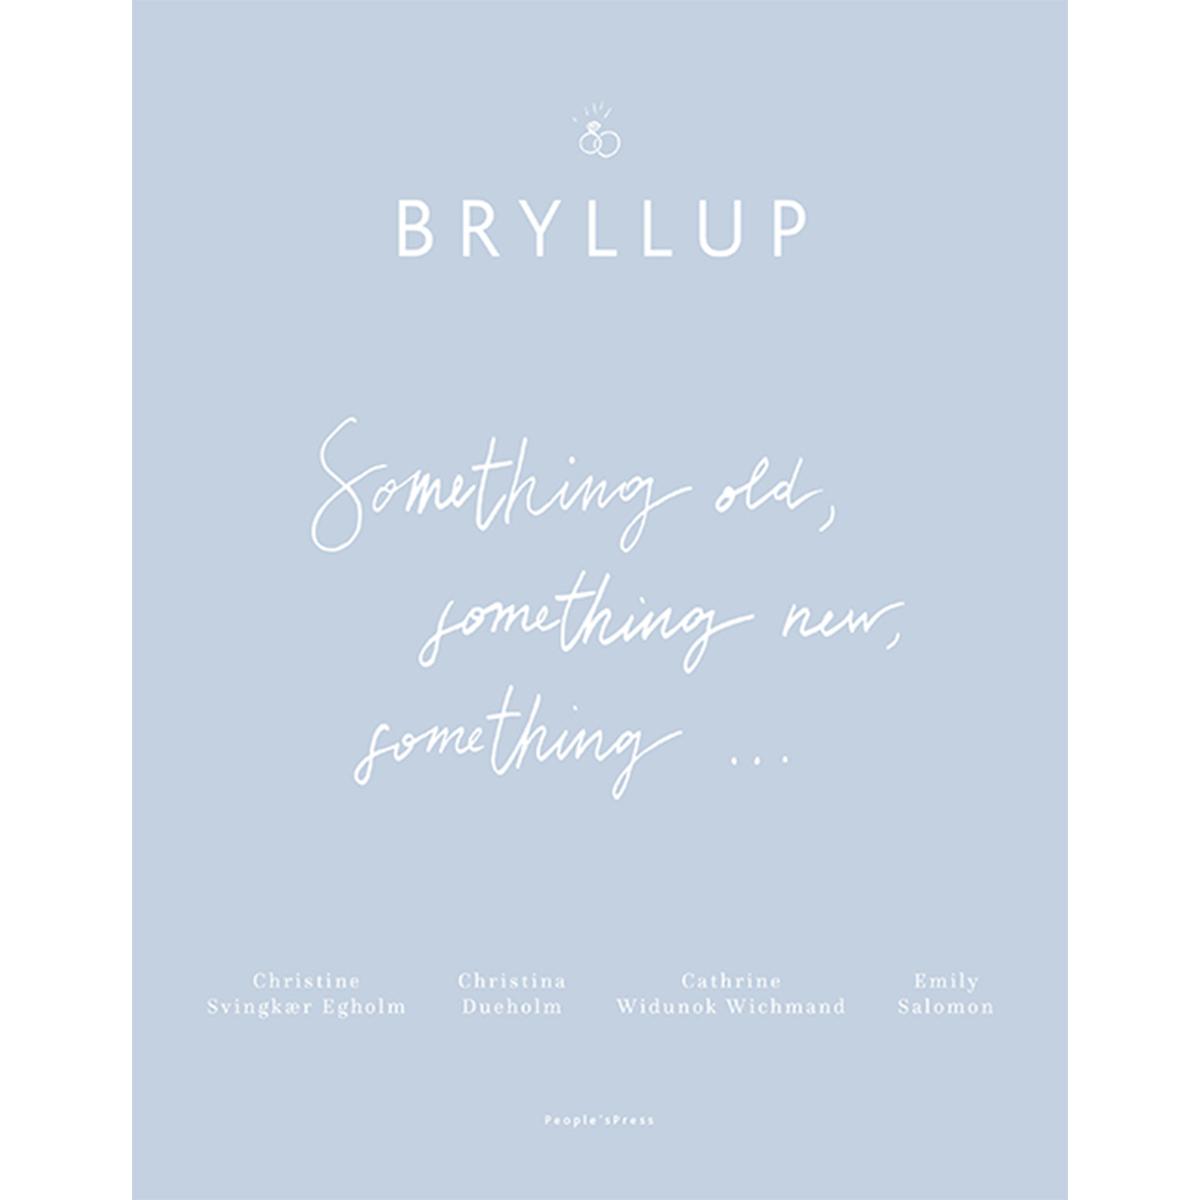 bfafadd8 Bryllup - Something old, something new, something.. - Hæftet Af Cathrine W.  Wickmand, Emily Salomon, Christina Dueholm m.fl. - Coop.dk